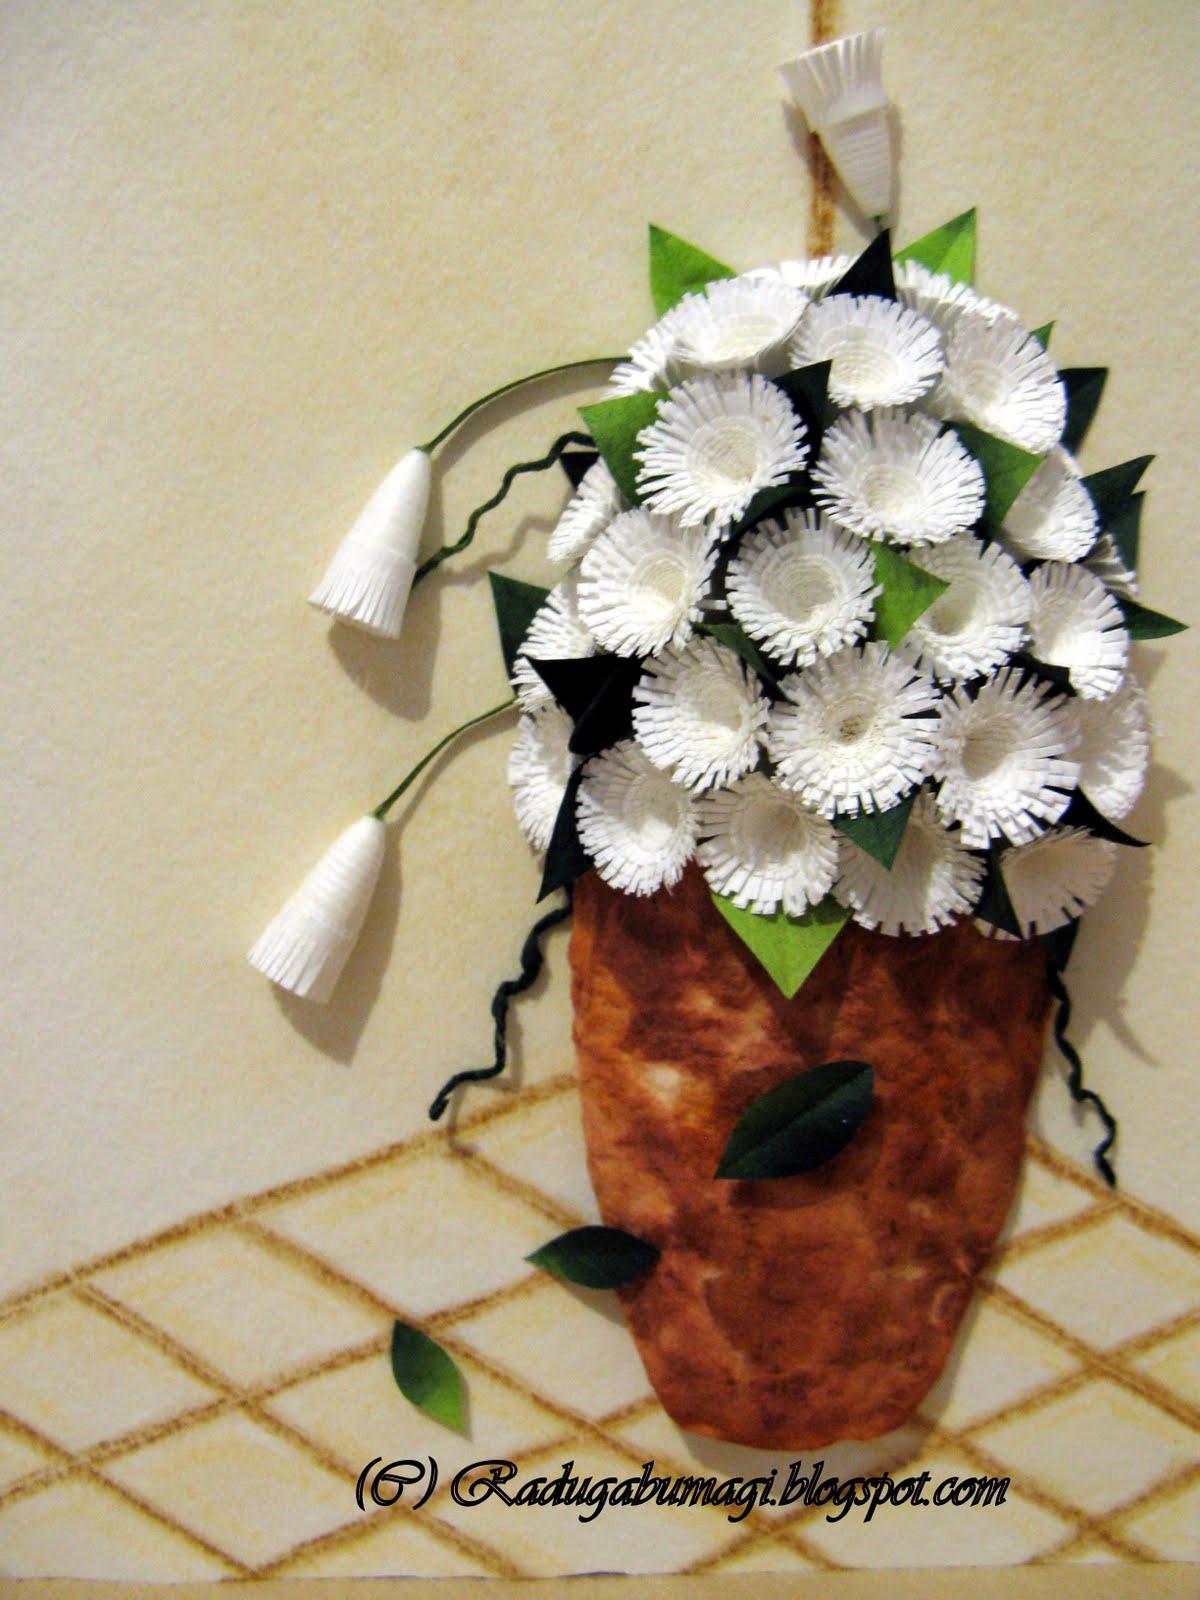 Читать мангу на русском Цветы, подобные цветкам сакуры